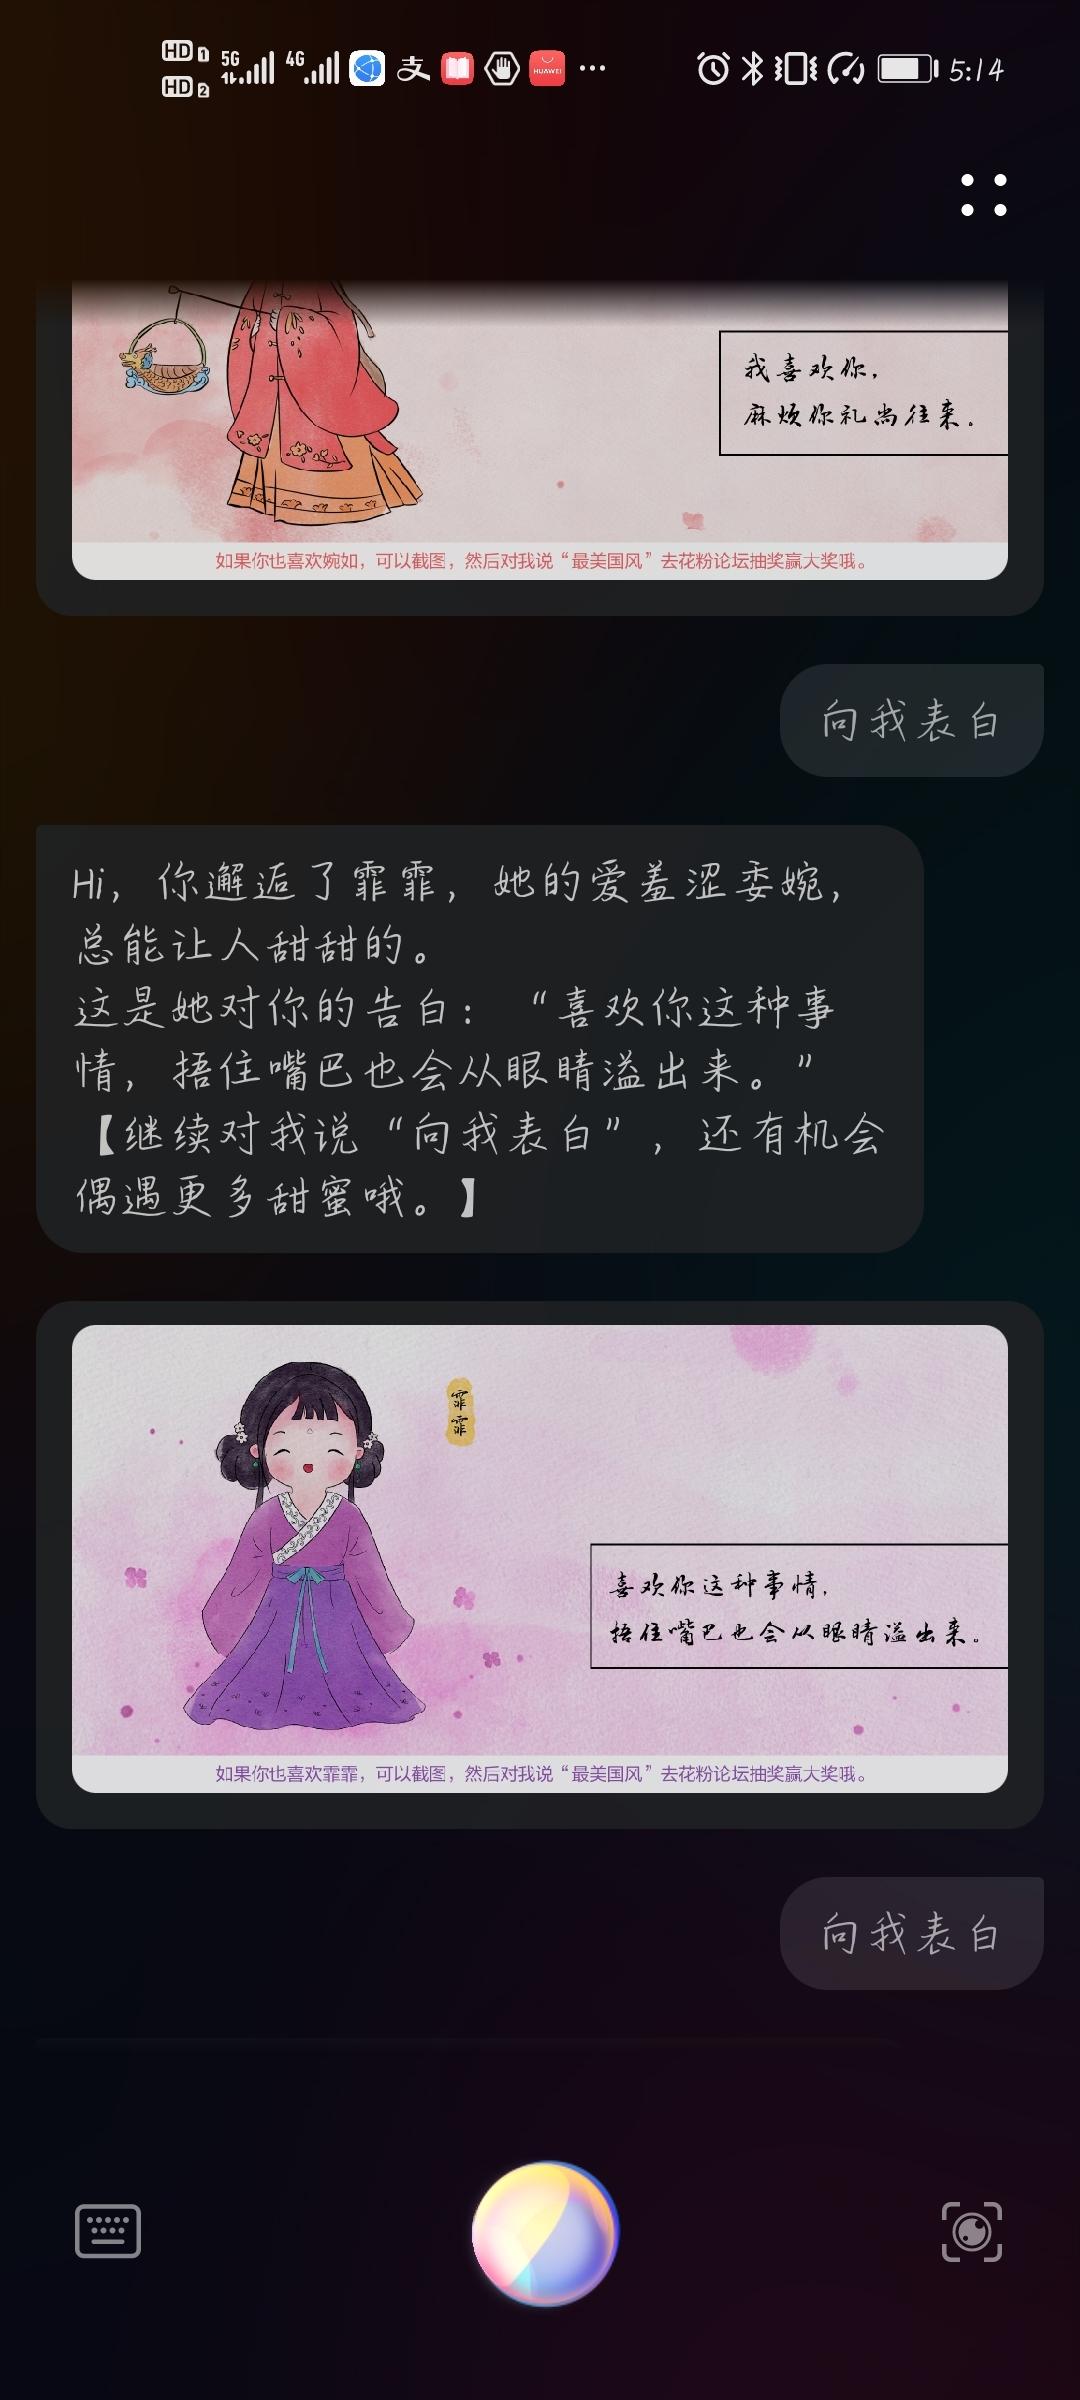 Screenshot_20210611_171412_com.huawei.vassistant.jpg